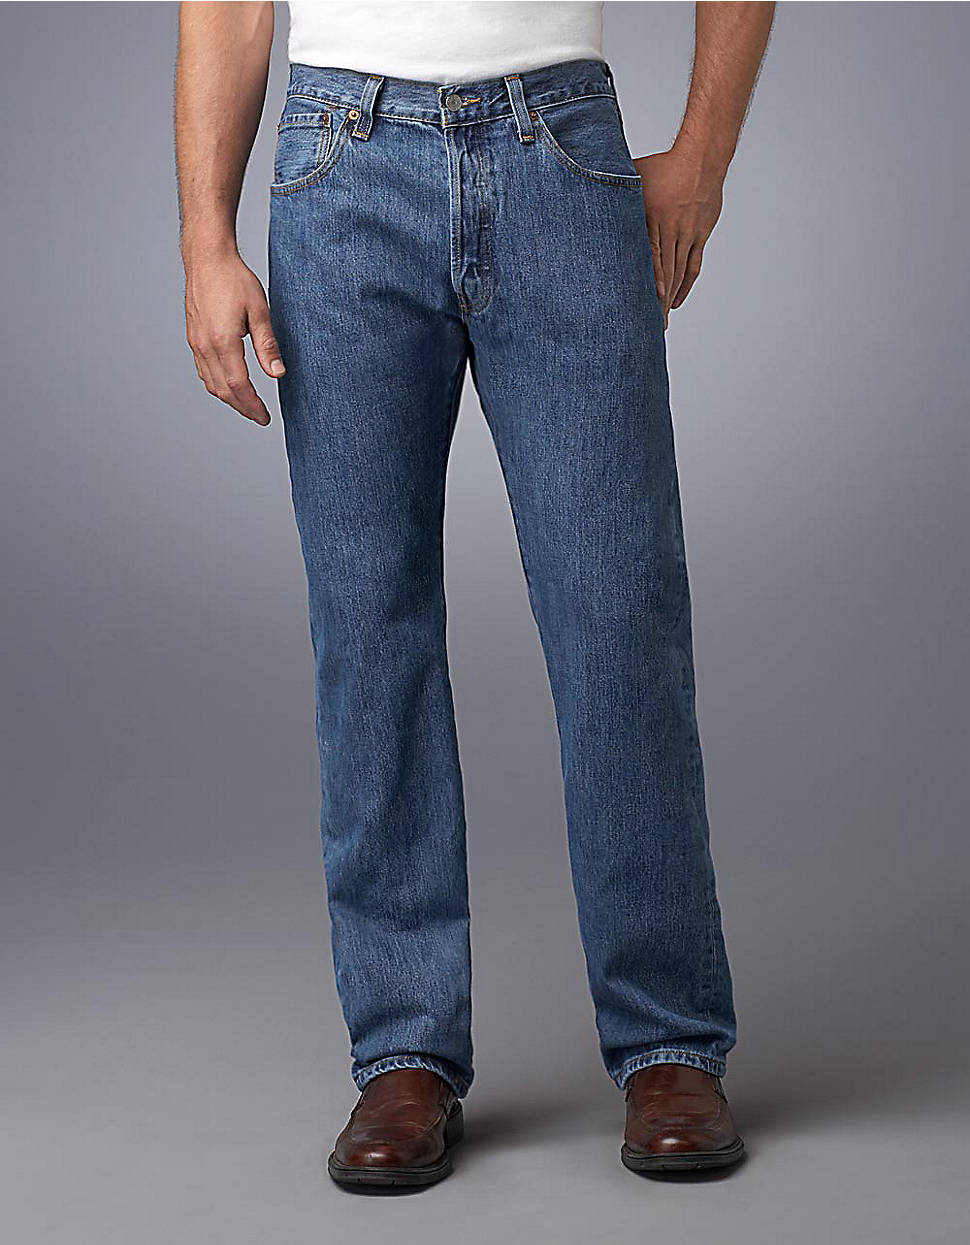 236fa28df87 I need some new jeans. Size 38 x 36. Color: Medium Stonewash